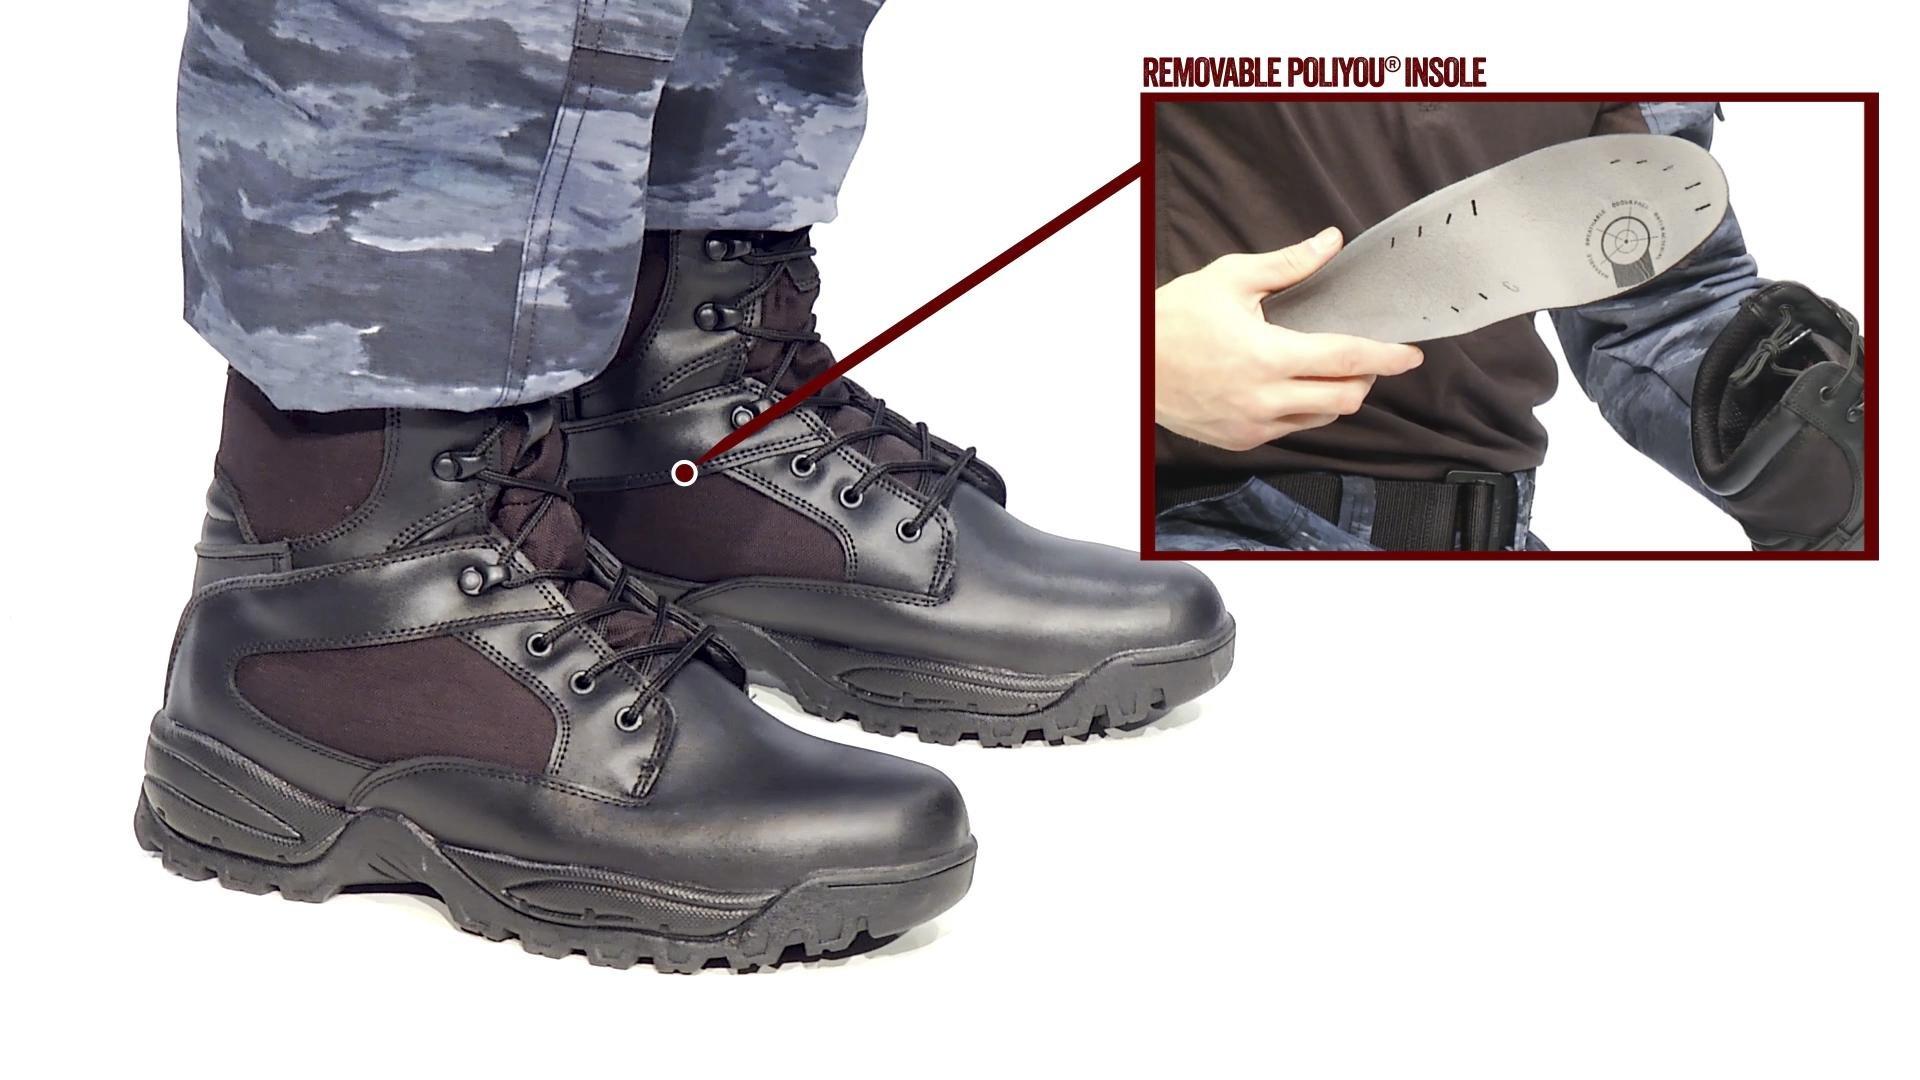 TRU-SPEC 4062012 9'' Tactical Assault Boot, Leather and Cordura Nylon, 13 Regular, Black